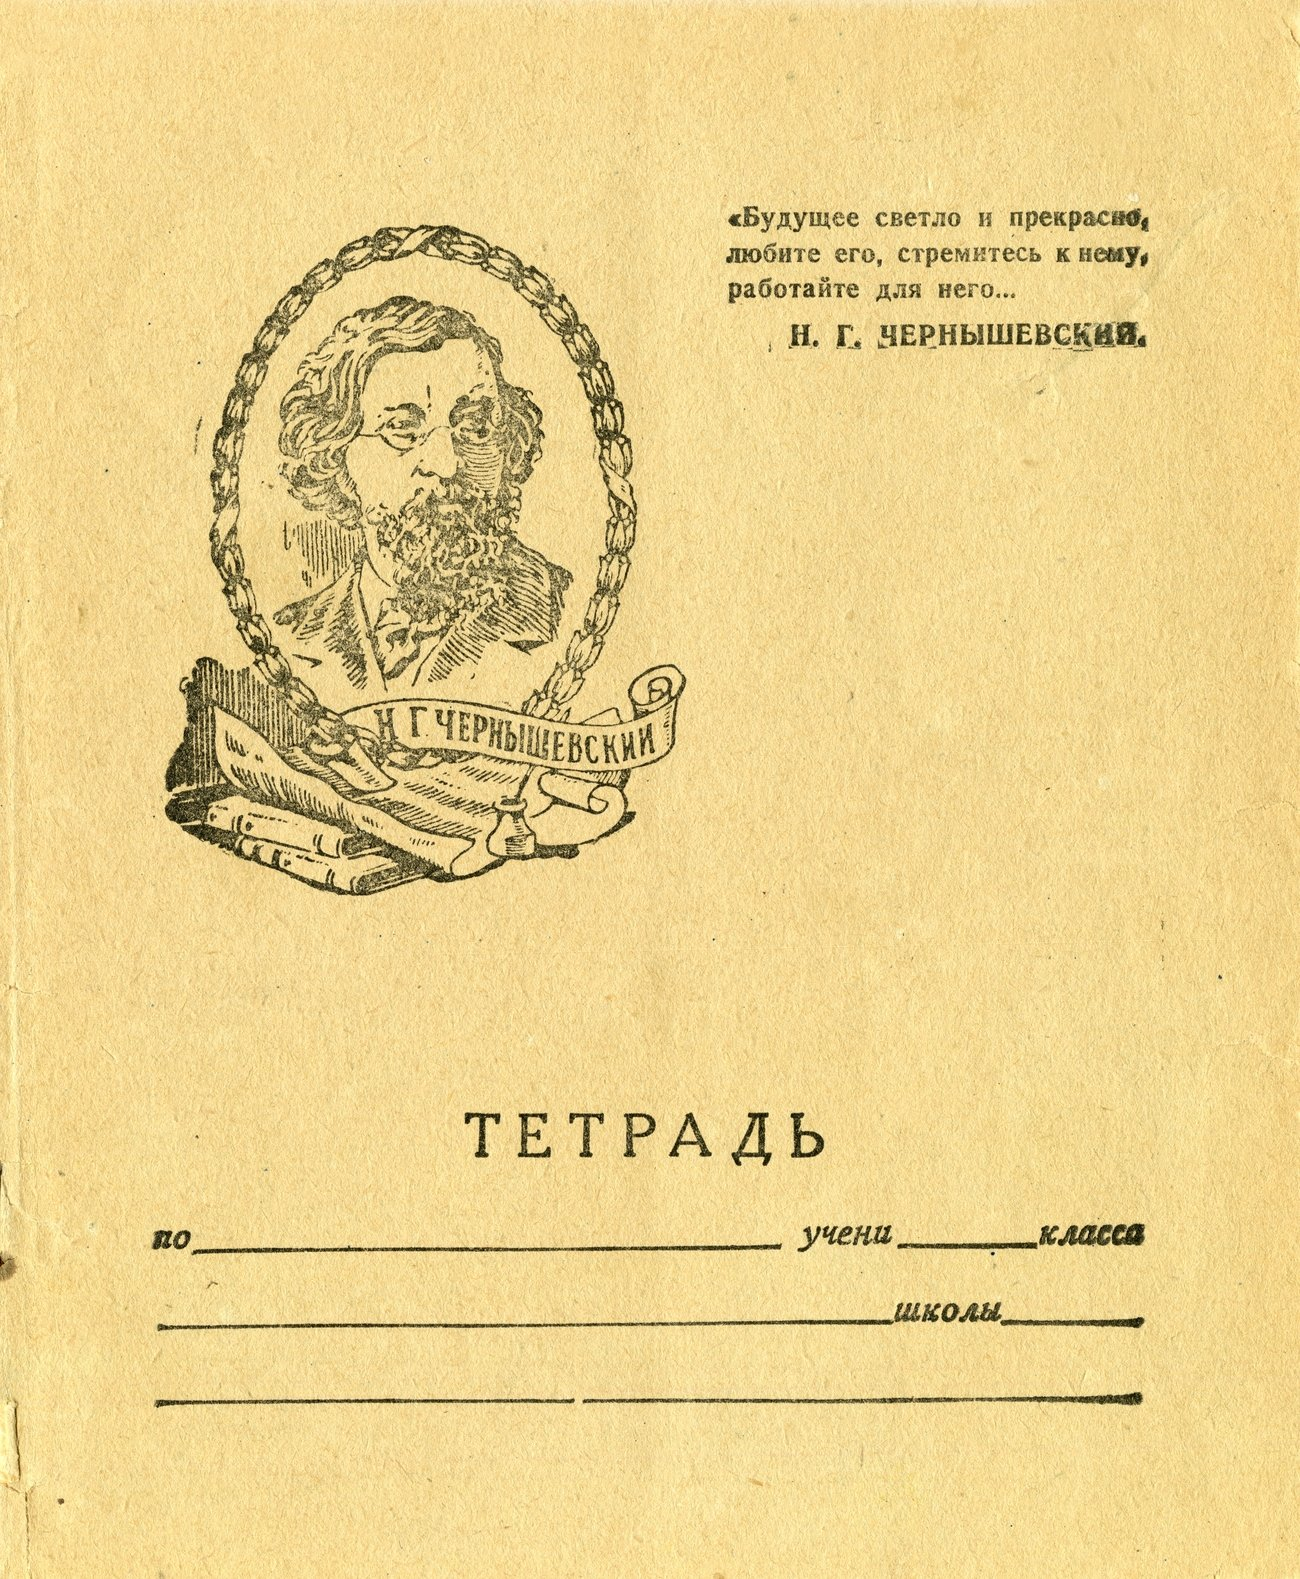 Тетрадь СССР 32